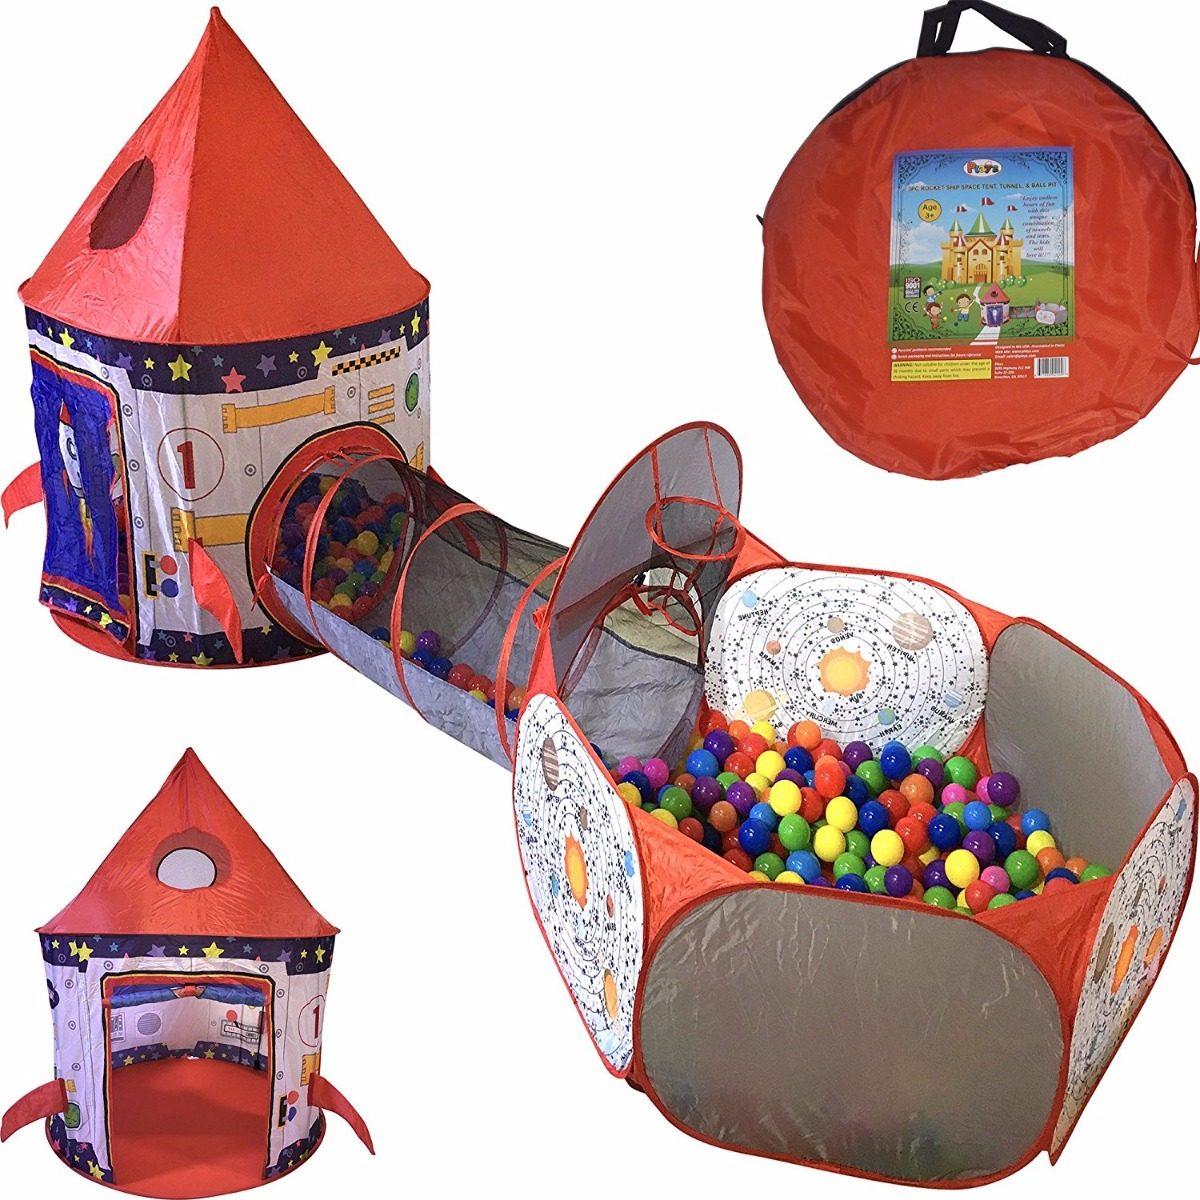 1fjktcul3 Tienda Tunel Juguete Xozupkit Para Pelotas Pozo Niños Cohete n8mOvwNy0